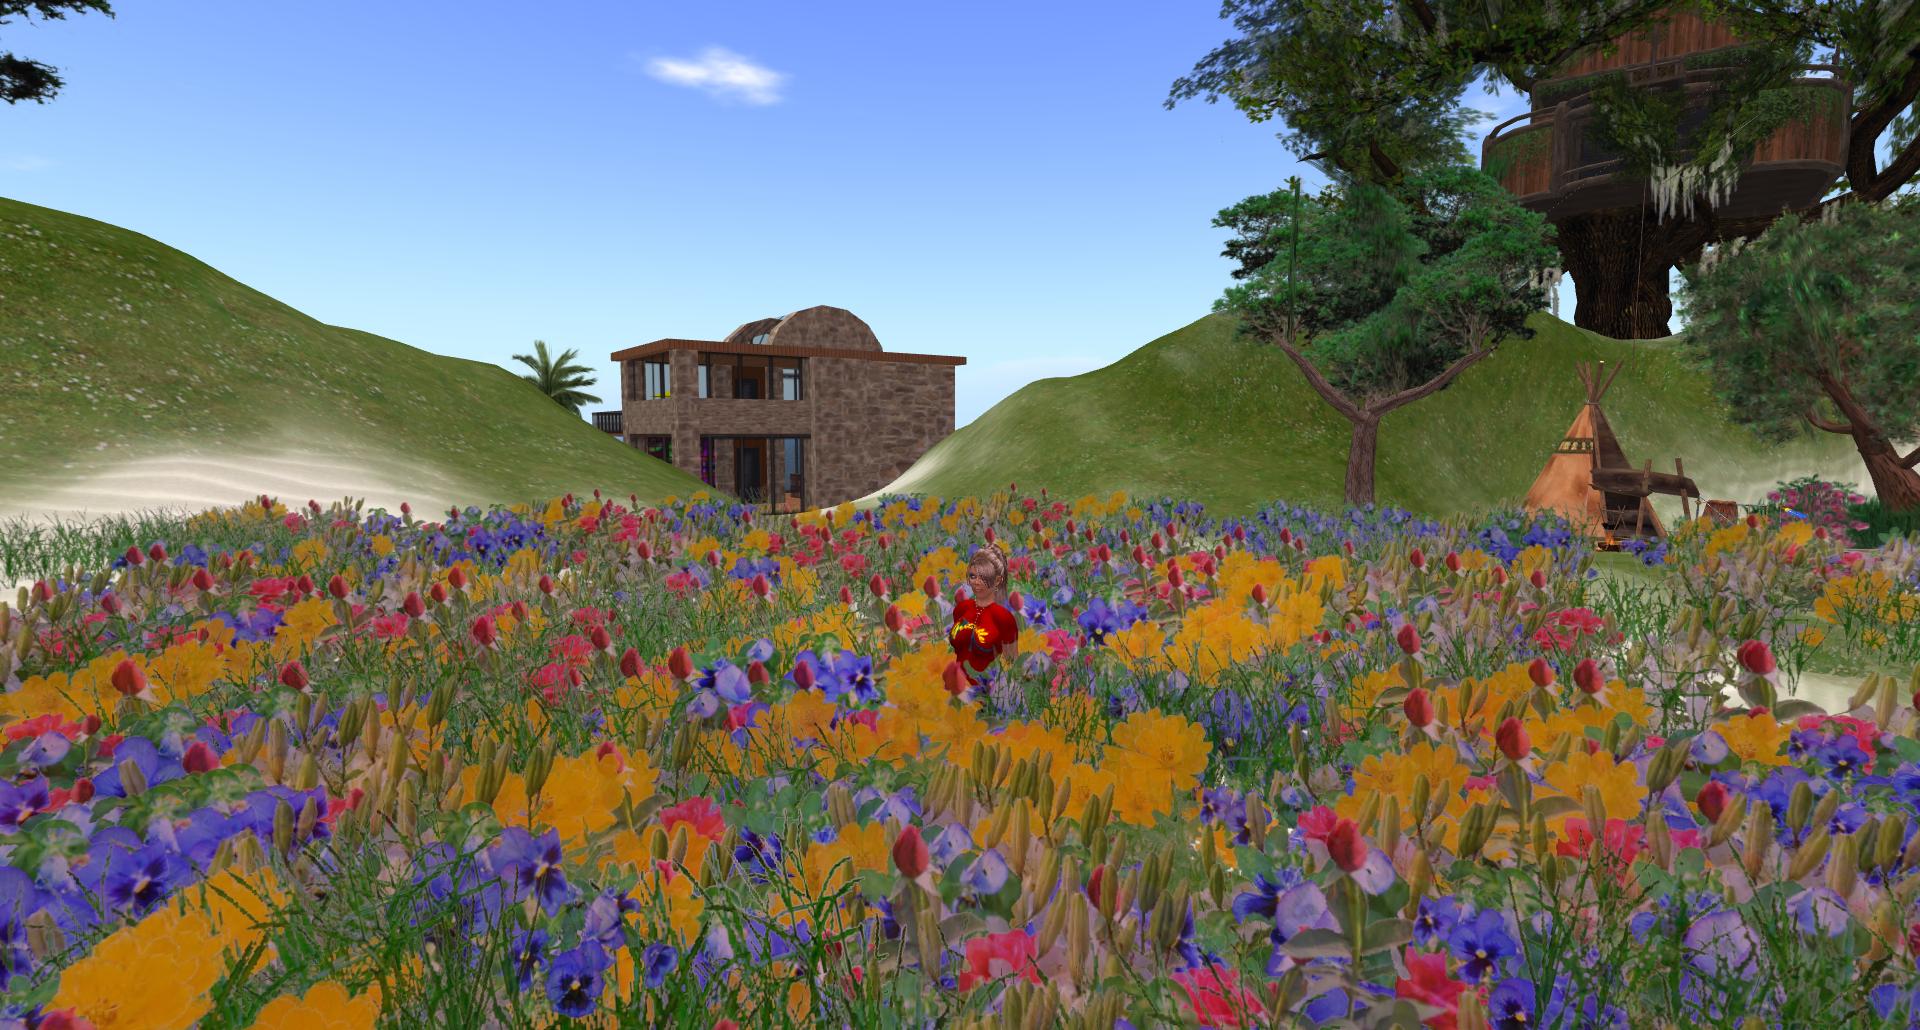 Jewles spring flower planting jewle rae flower garden particles emitter 042410002 mightylinksfo Images